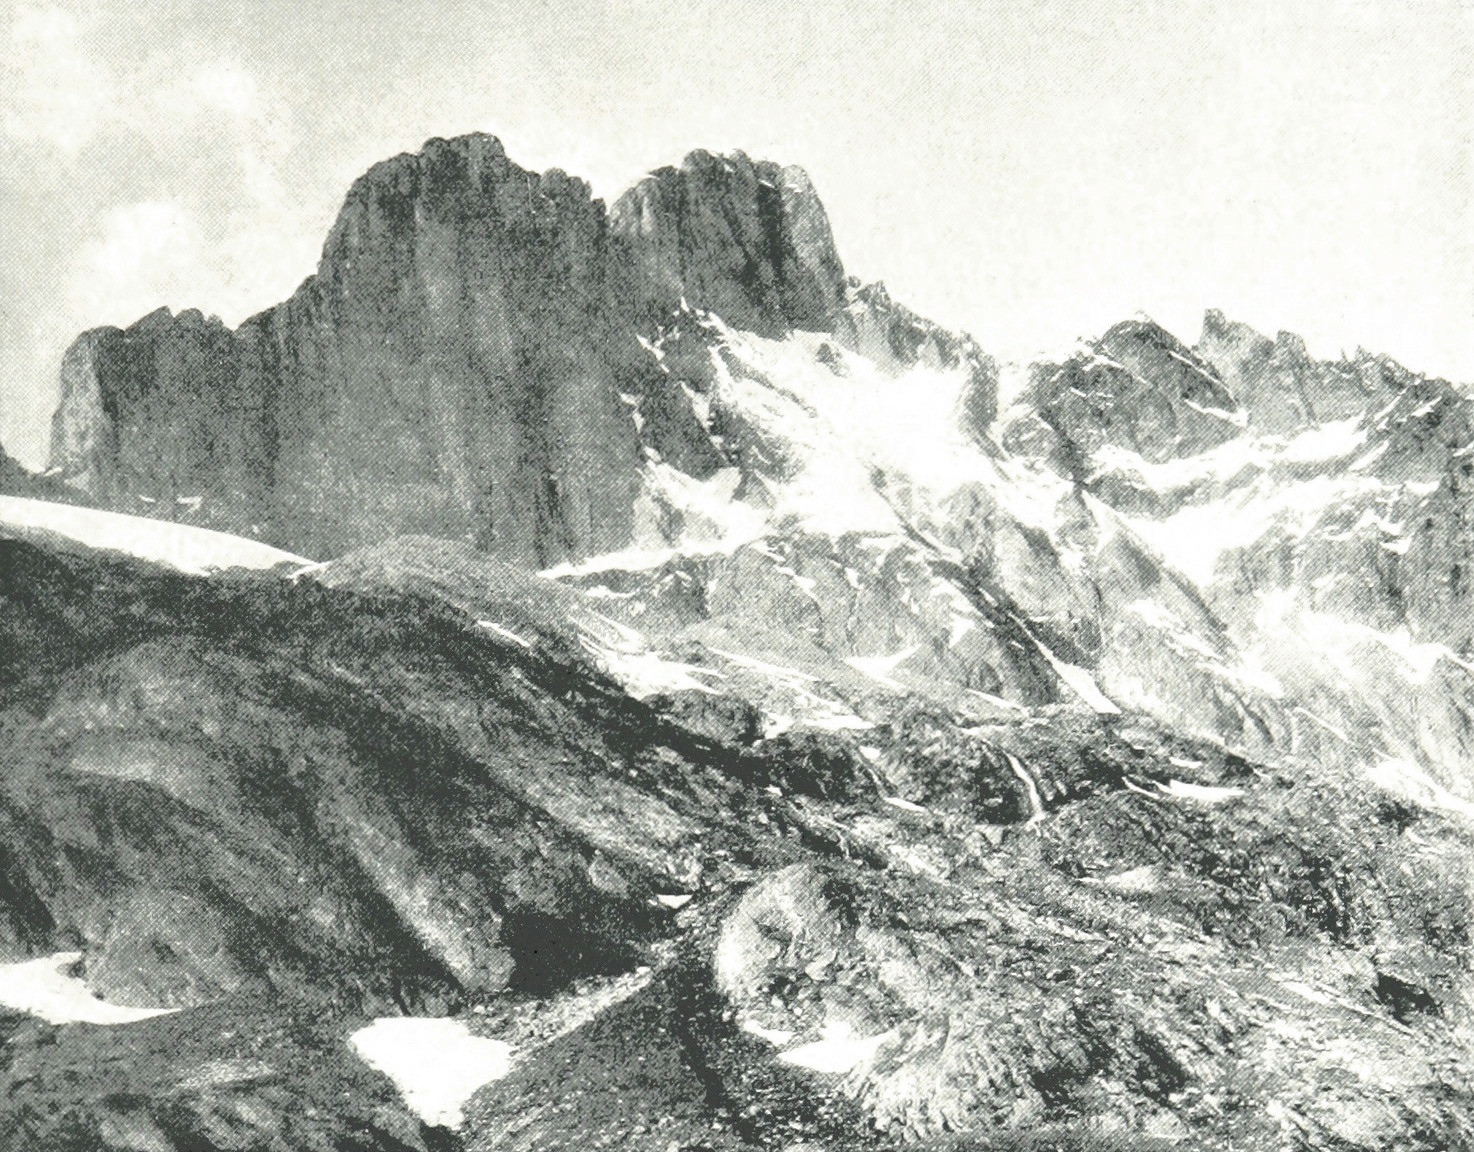 Wetterhorn vu de la cabane Gleckstein par Theodor Wundt, 1898